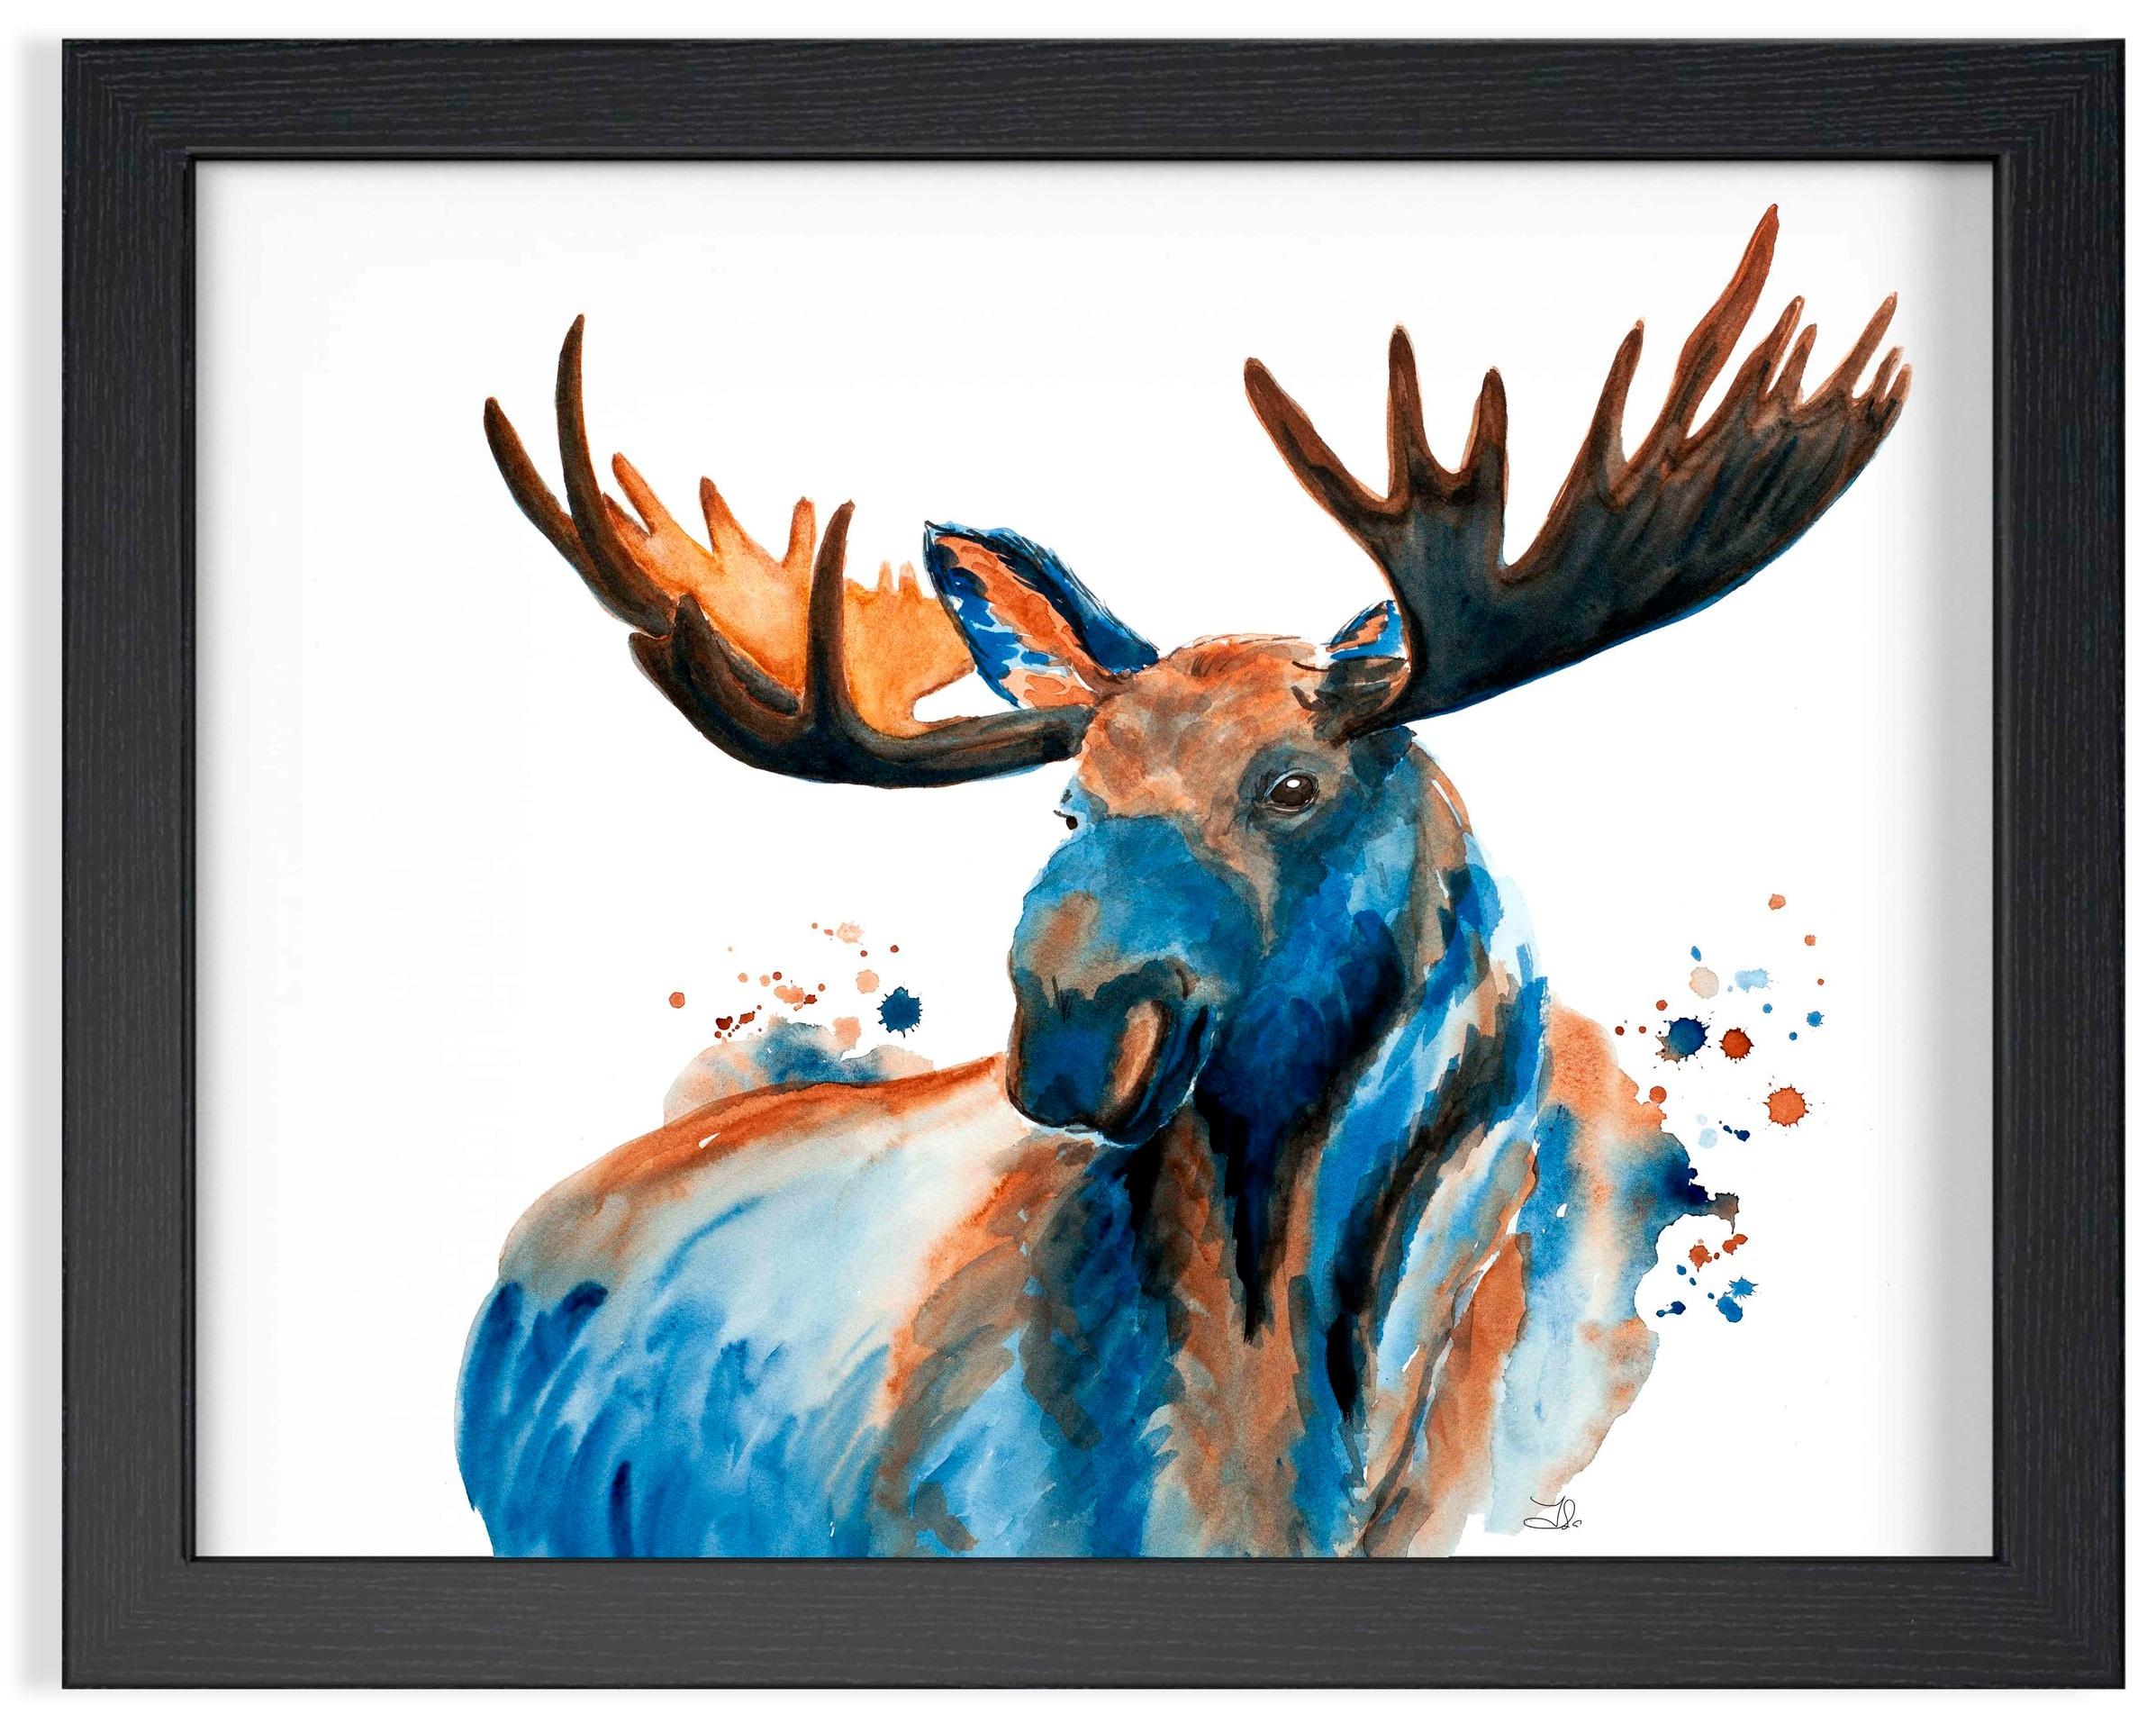 "Canadian Moose Watercolor  199. 00 $CA Fabriano Artistico 100% Cotton  Original watercolor painting 16 x 20"" (41 x 51 cm)"